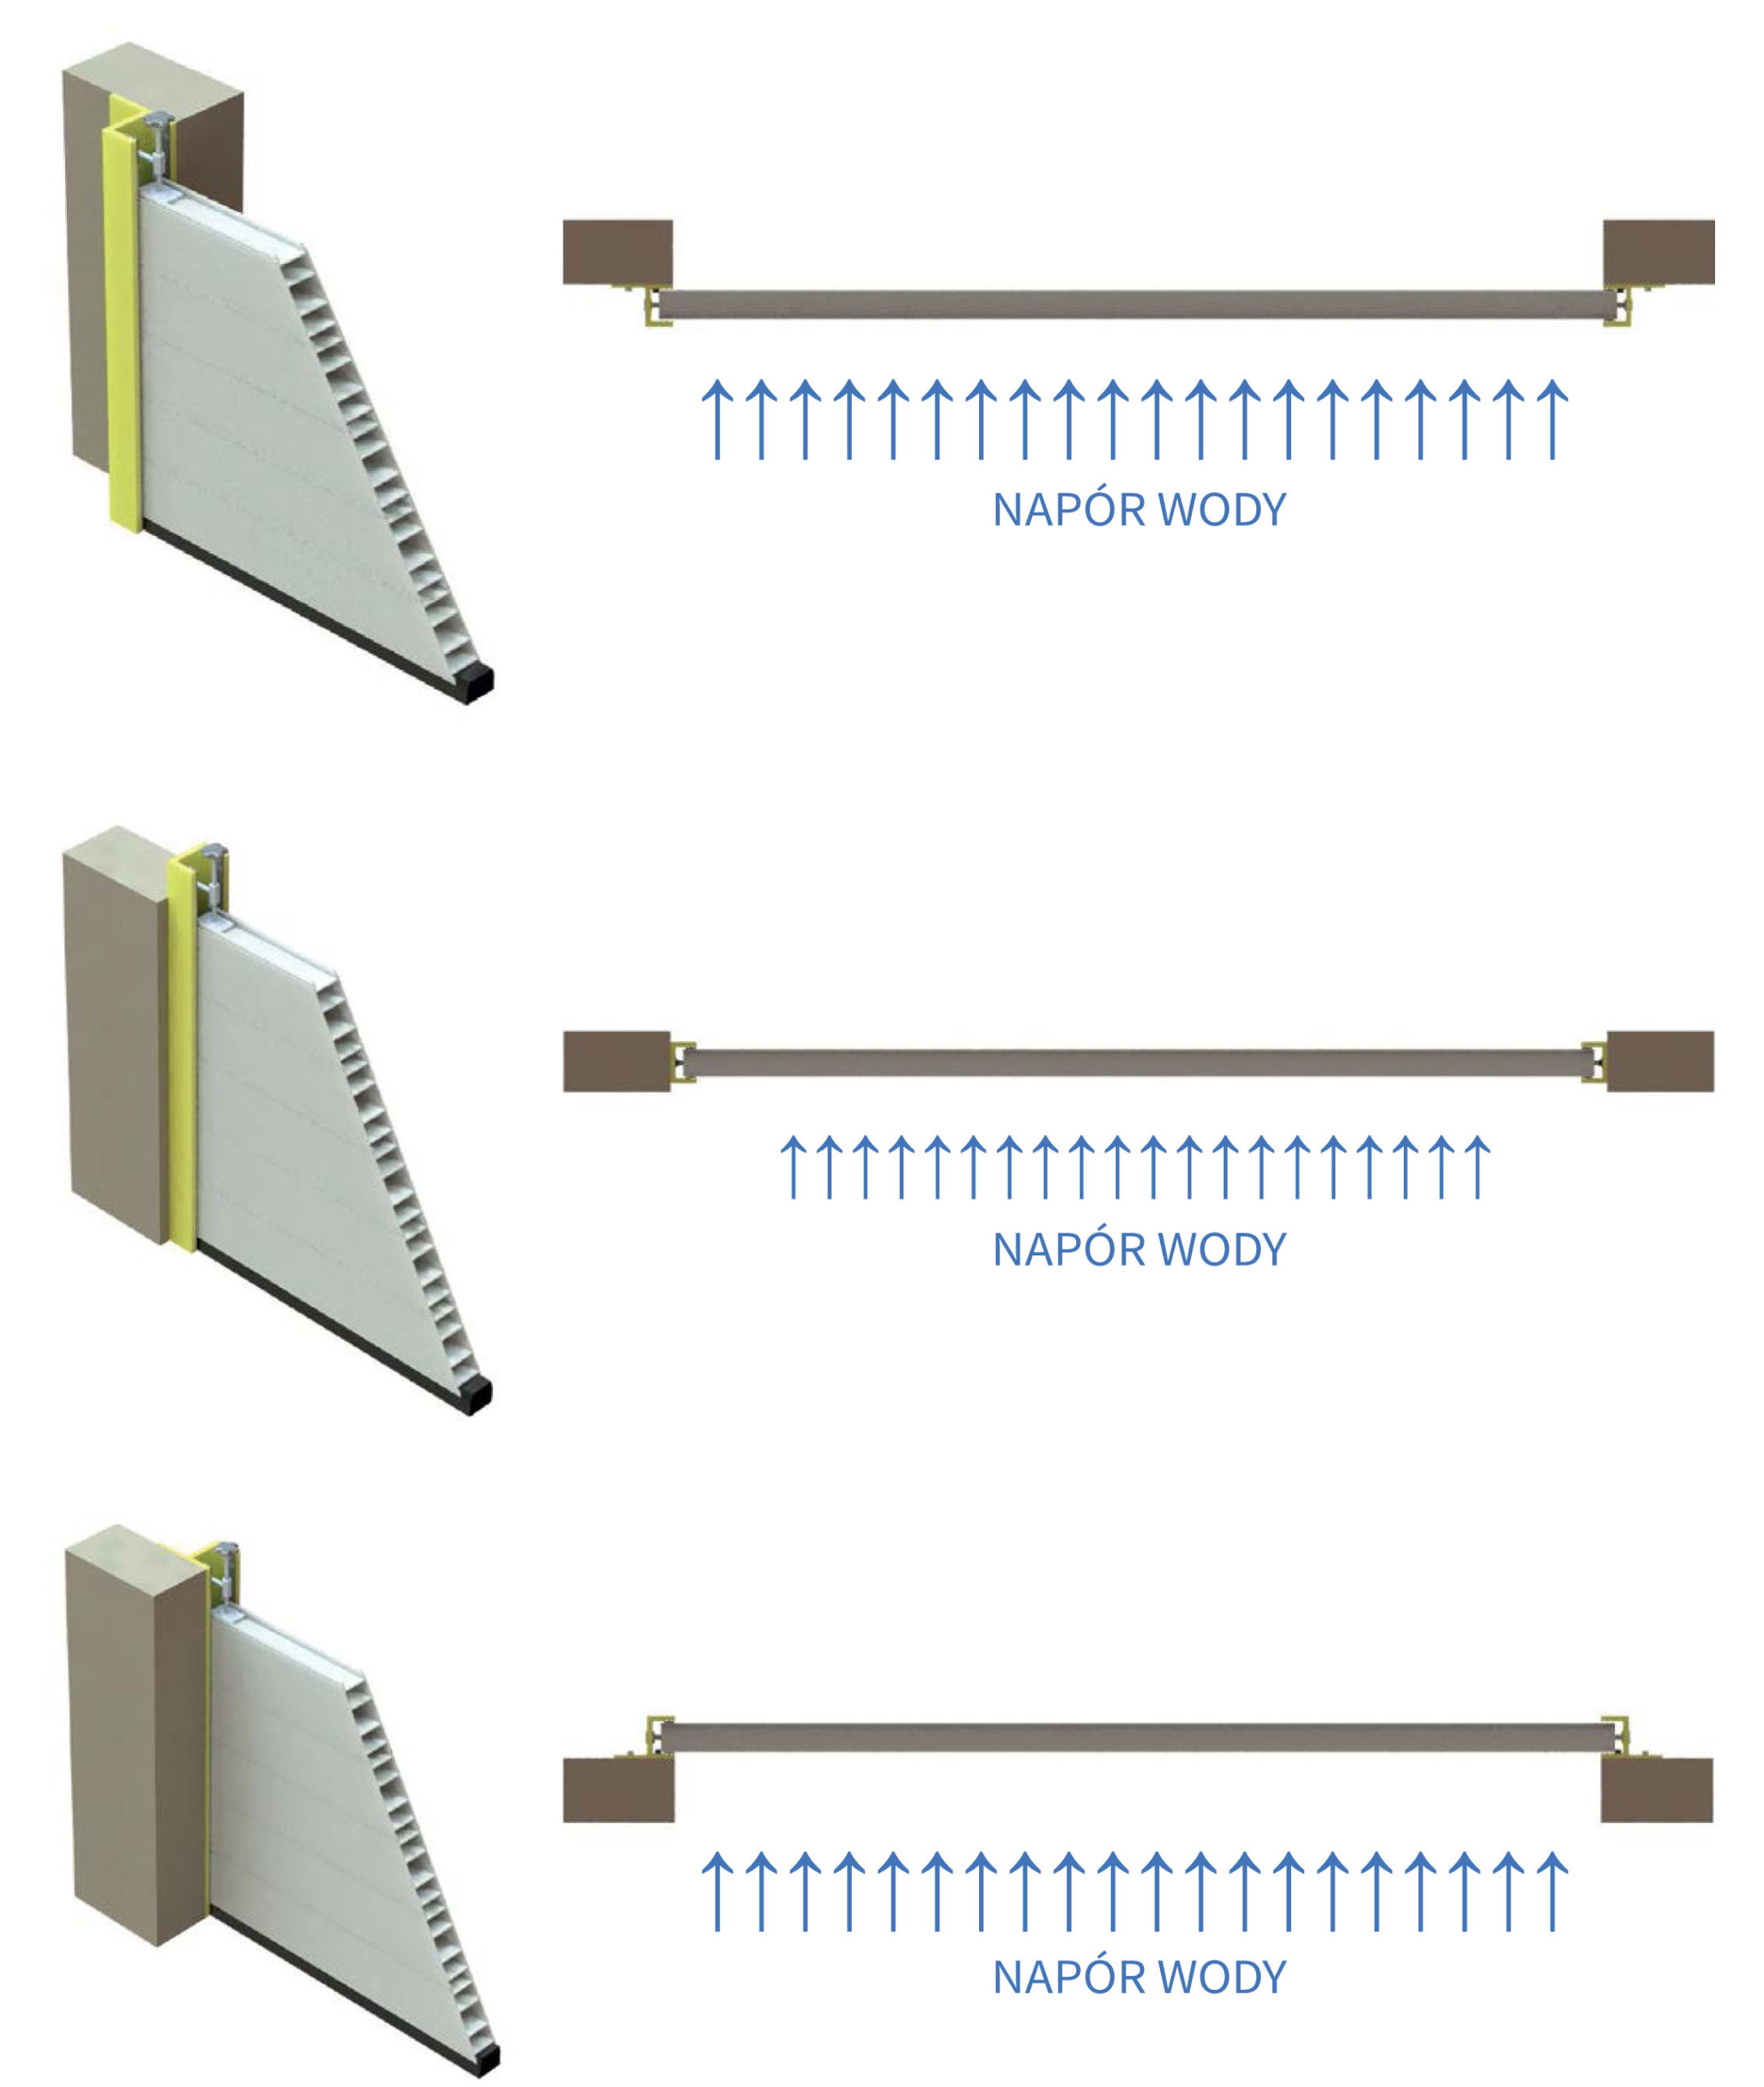 montaż bariery Floodwarden